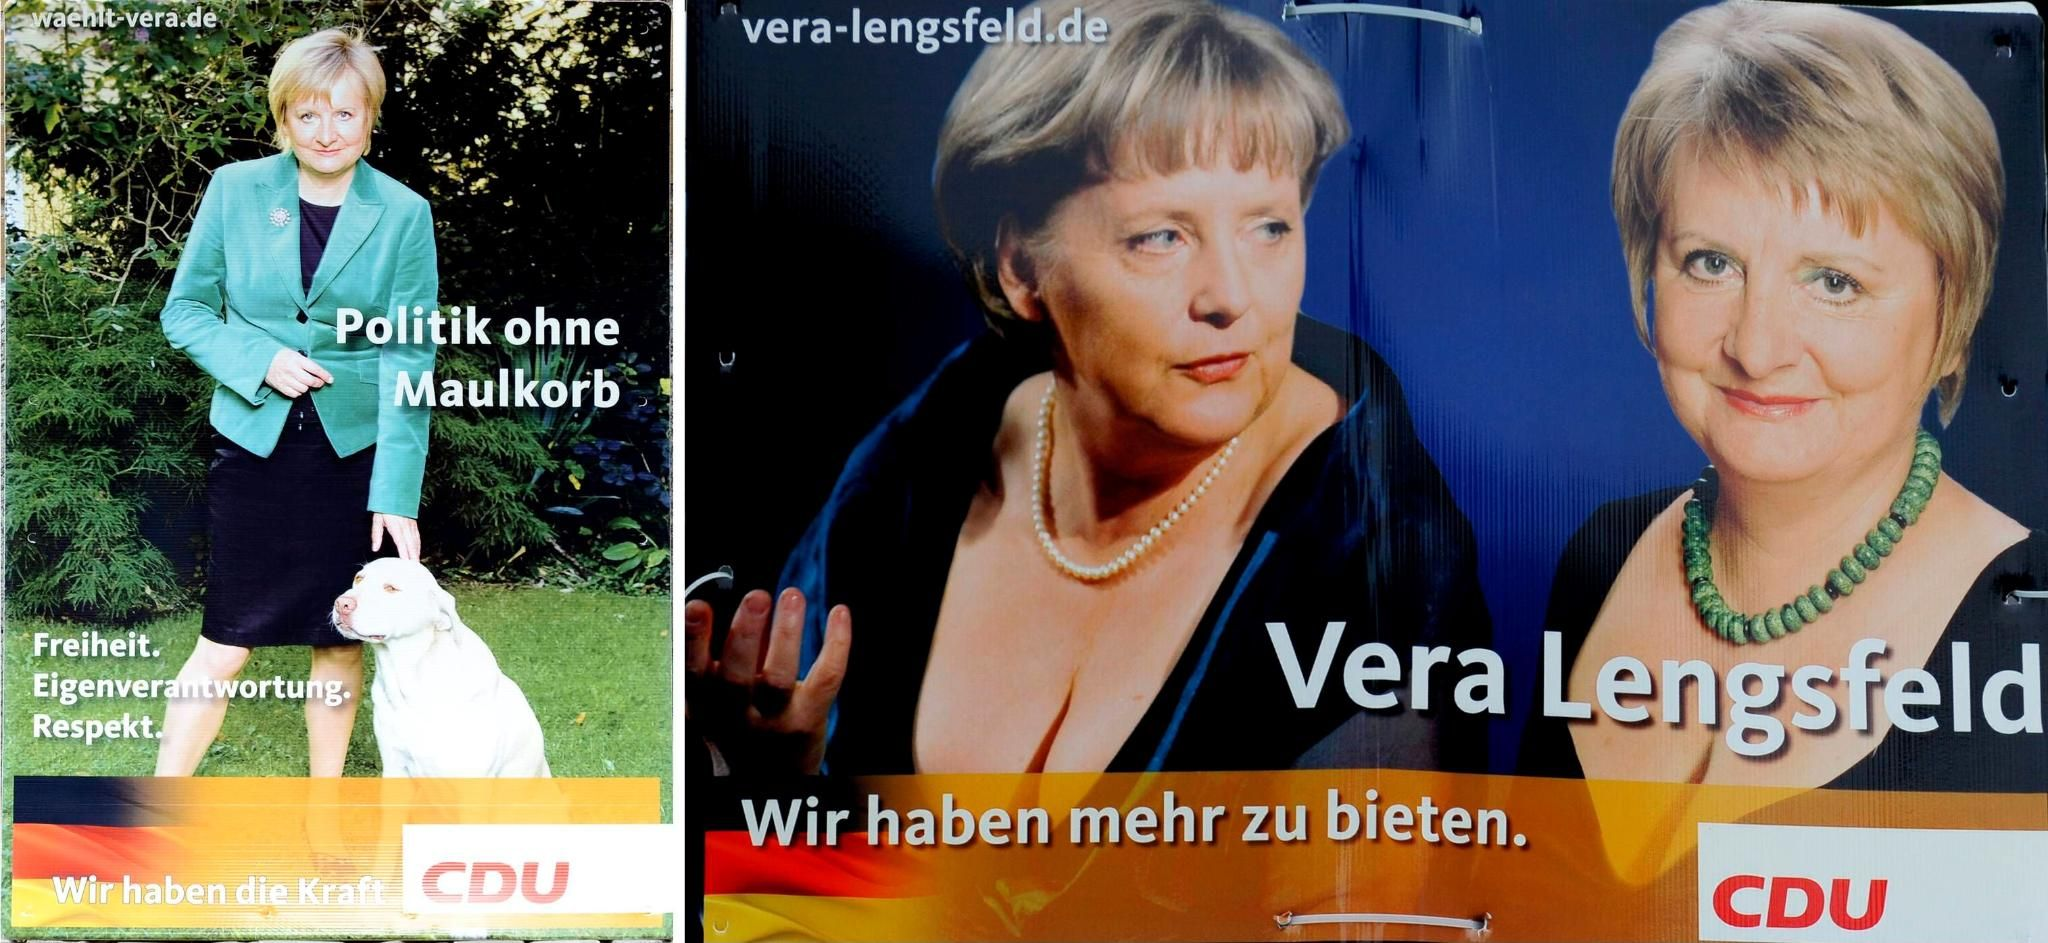 Angela Merkel (Marvelous Cleavage) - German And Austrian Female Politicians